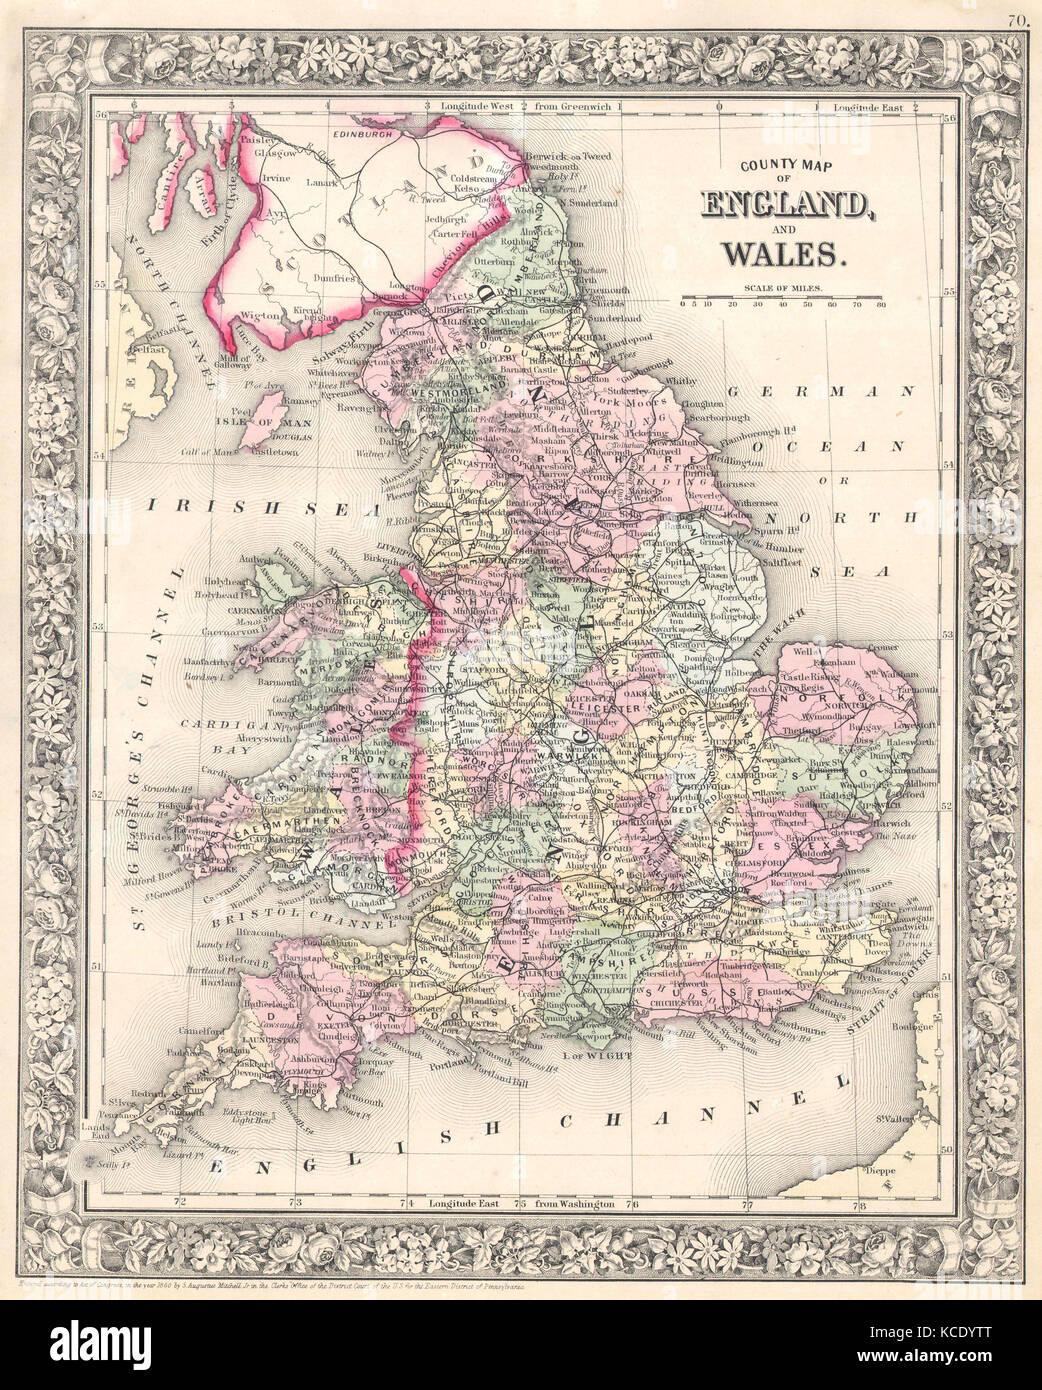 England longitude stock photos england longitude stock images alamy 1864 mitchell map of england and wales stock image gumiabroncs Gallery